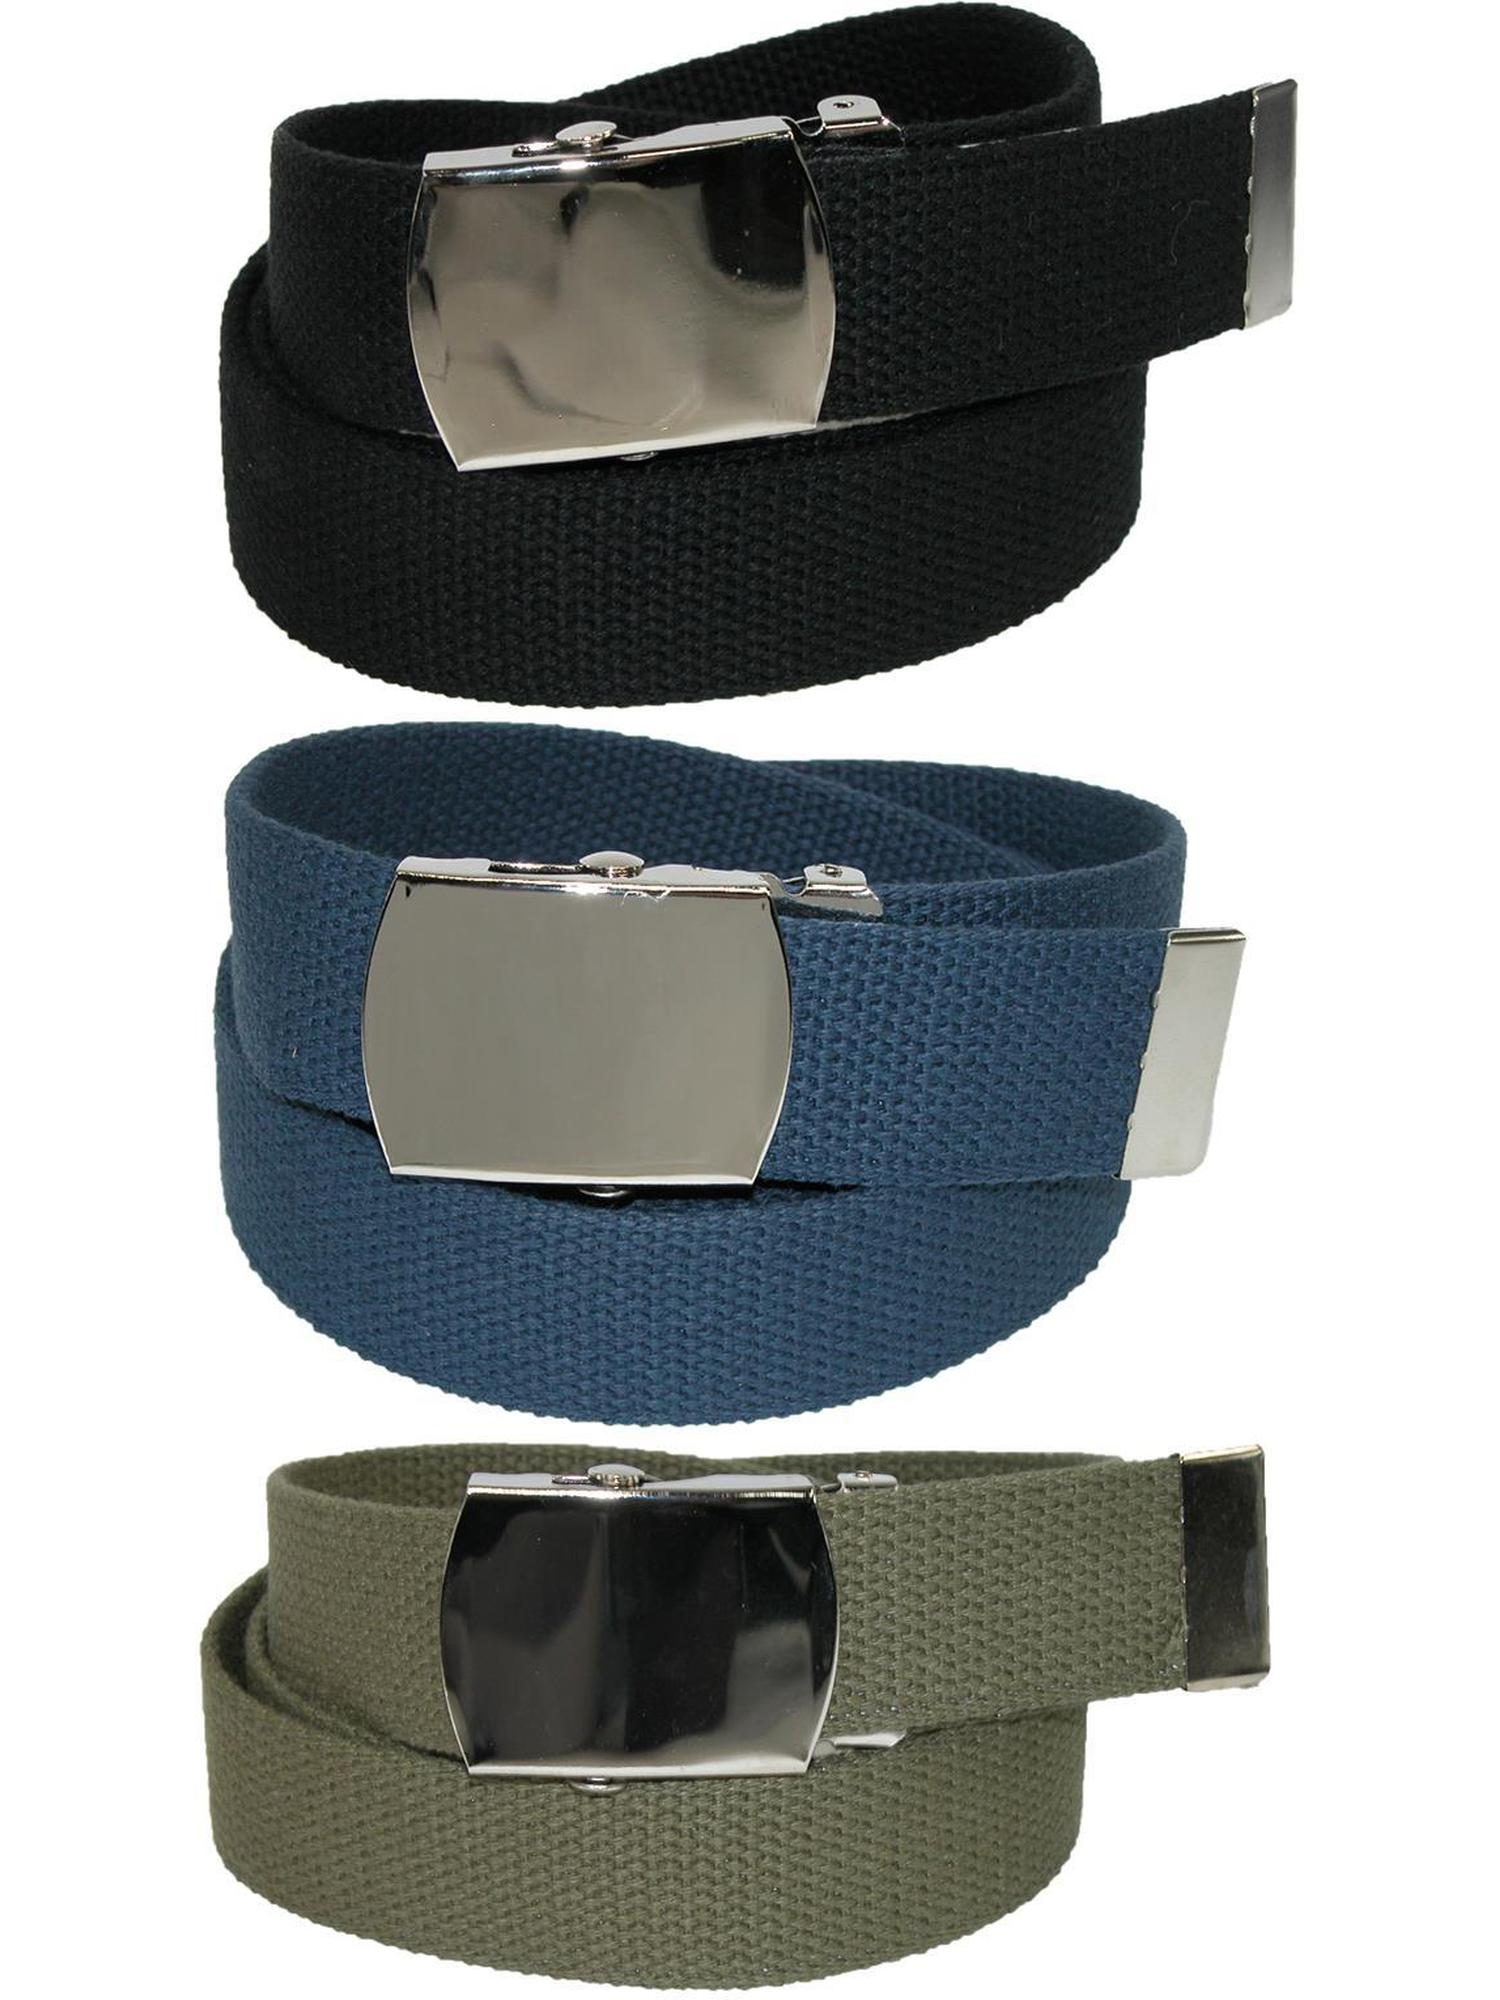 Pack of 3 CTM Mens Big /& Tall Belt with Flip Top Nickel Buckle